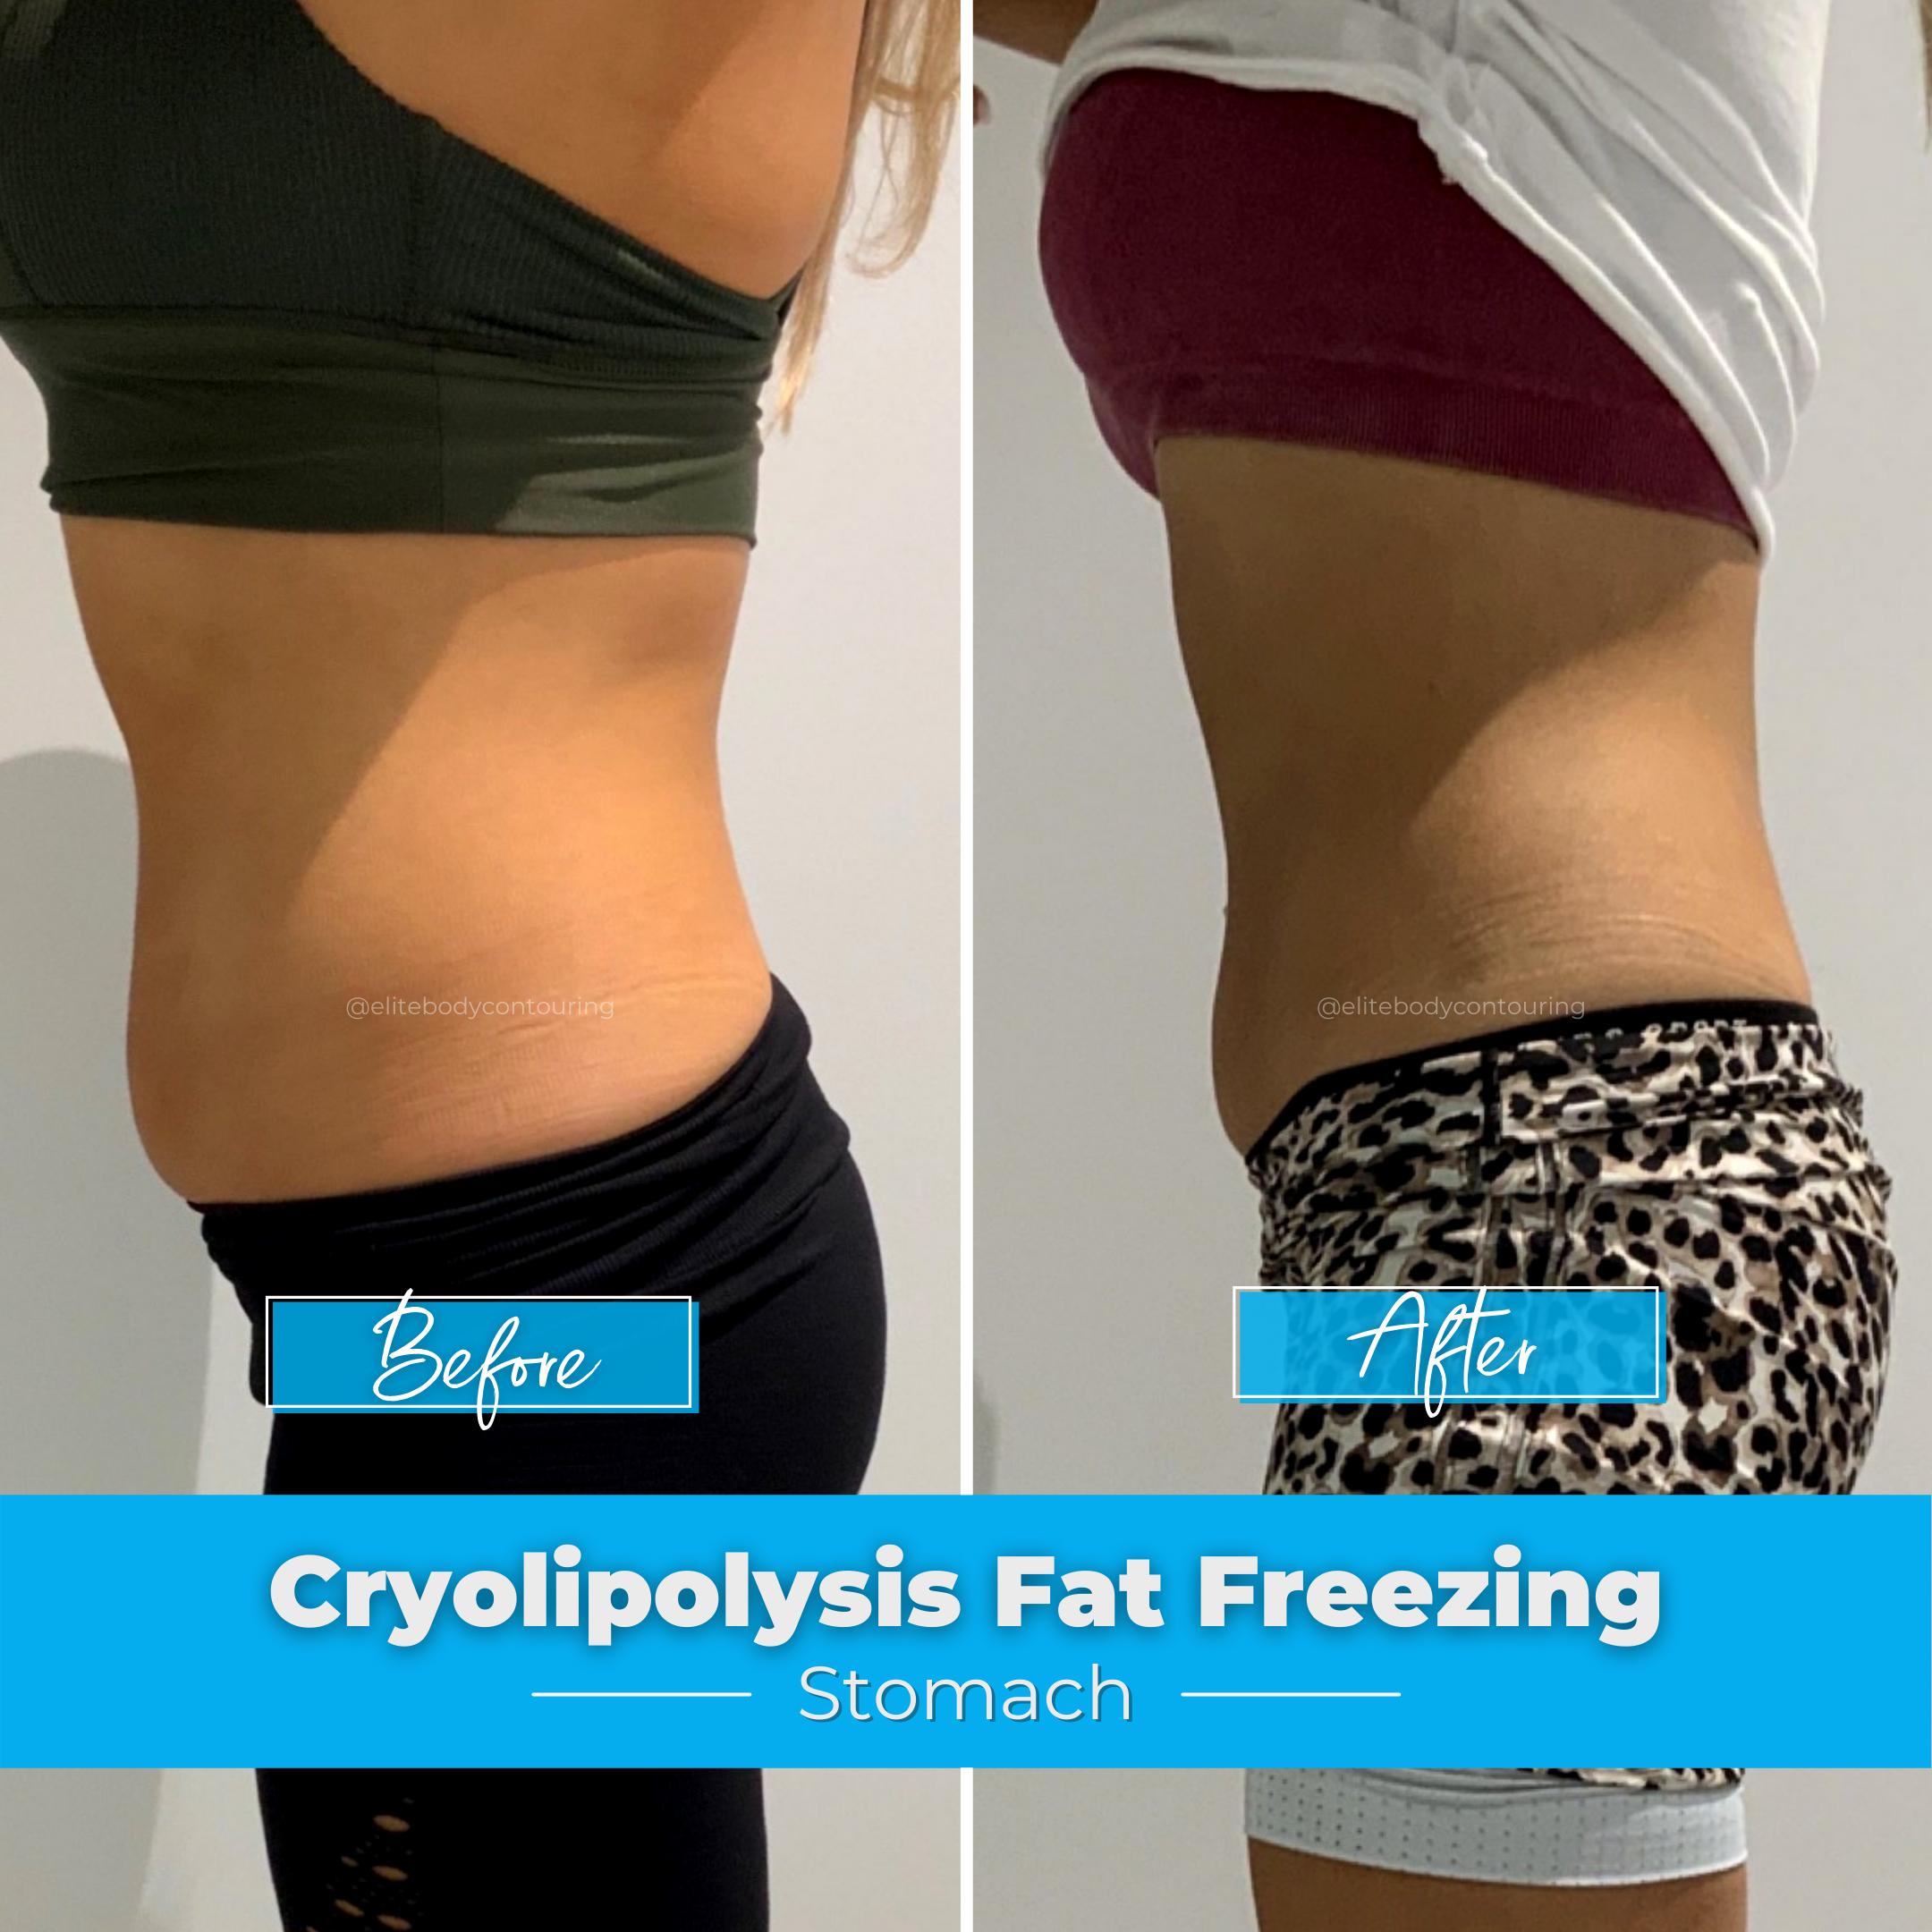 Cryolipolysis Fat Freezing - Stomach